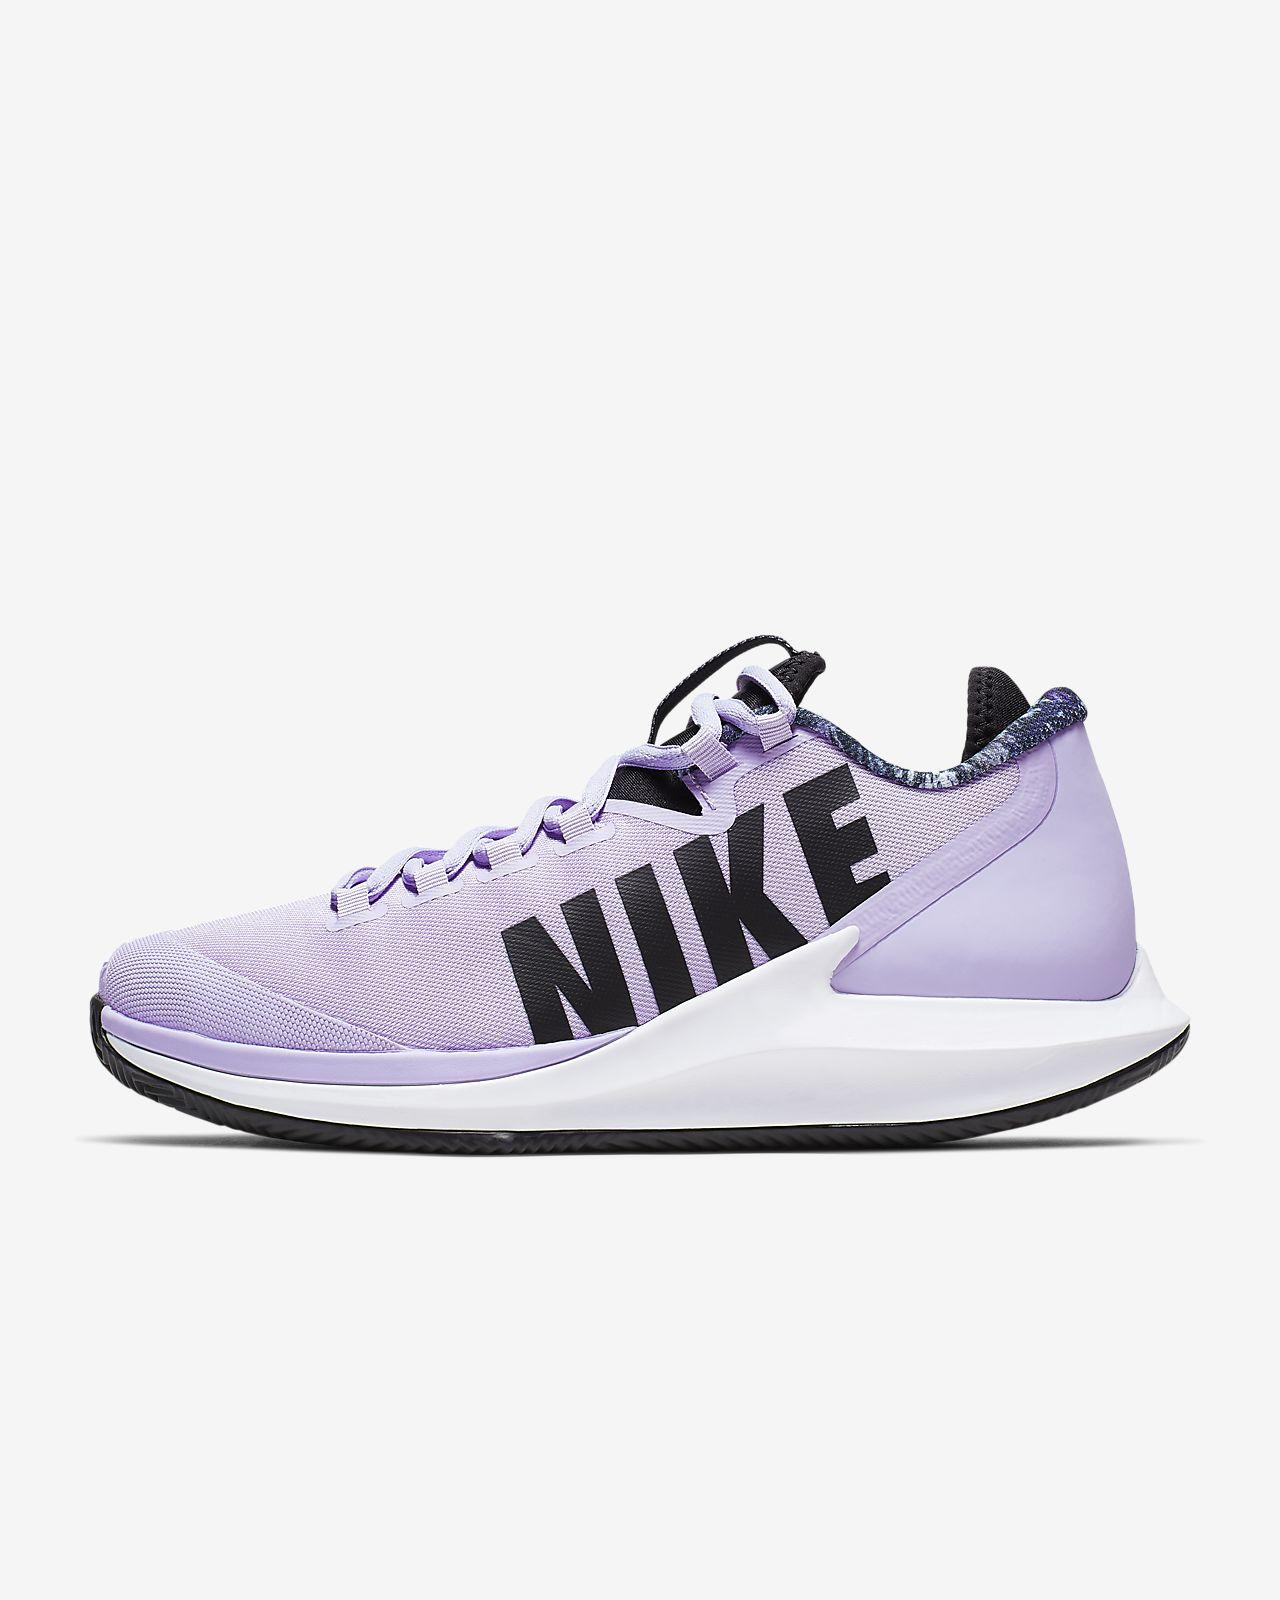 NikeCourt Air Zoom Zero Sabatilles de tennis per a terra batuda - Dona